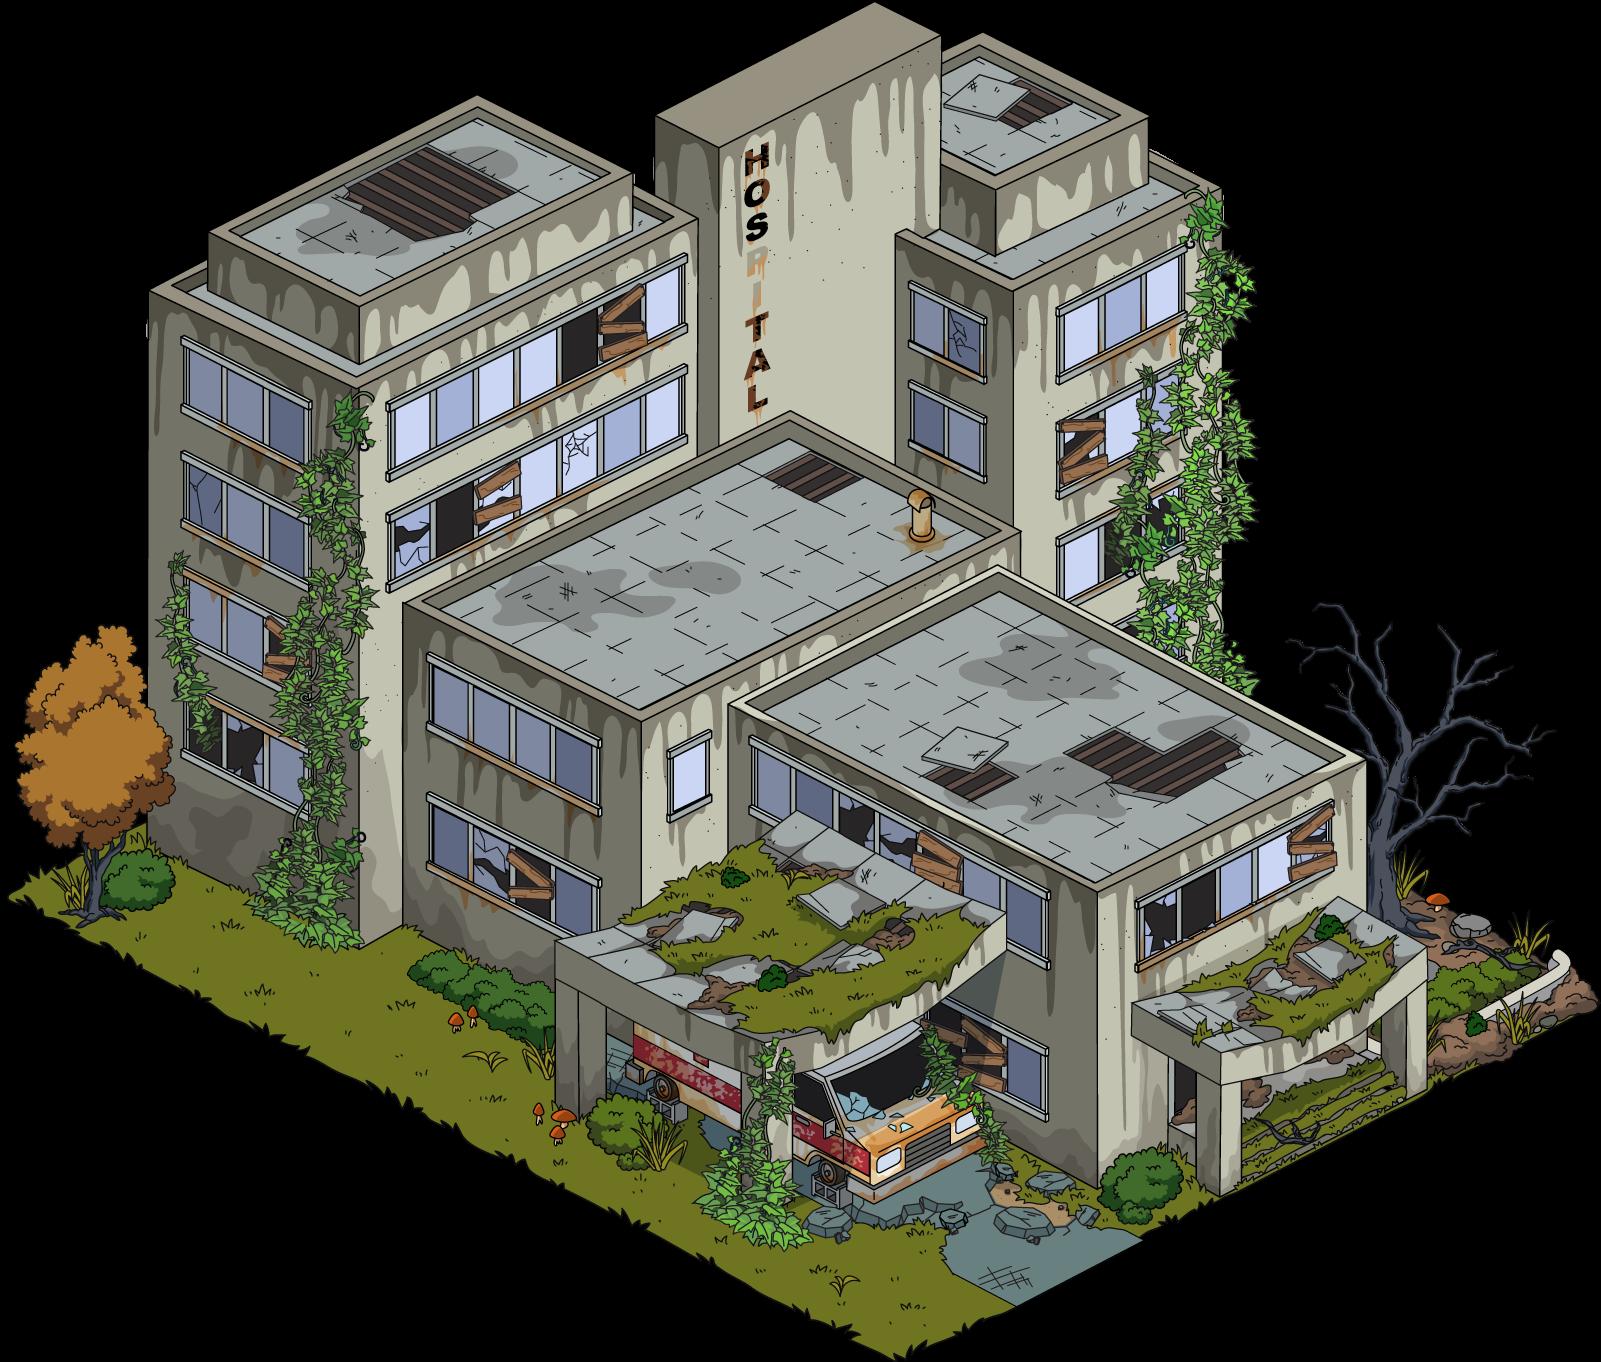 Abandoned house png. Image fg building hospital